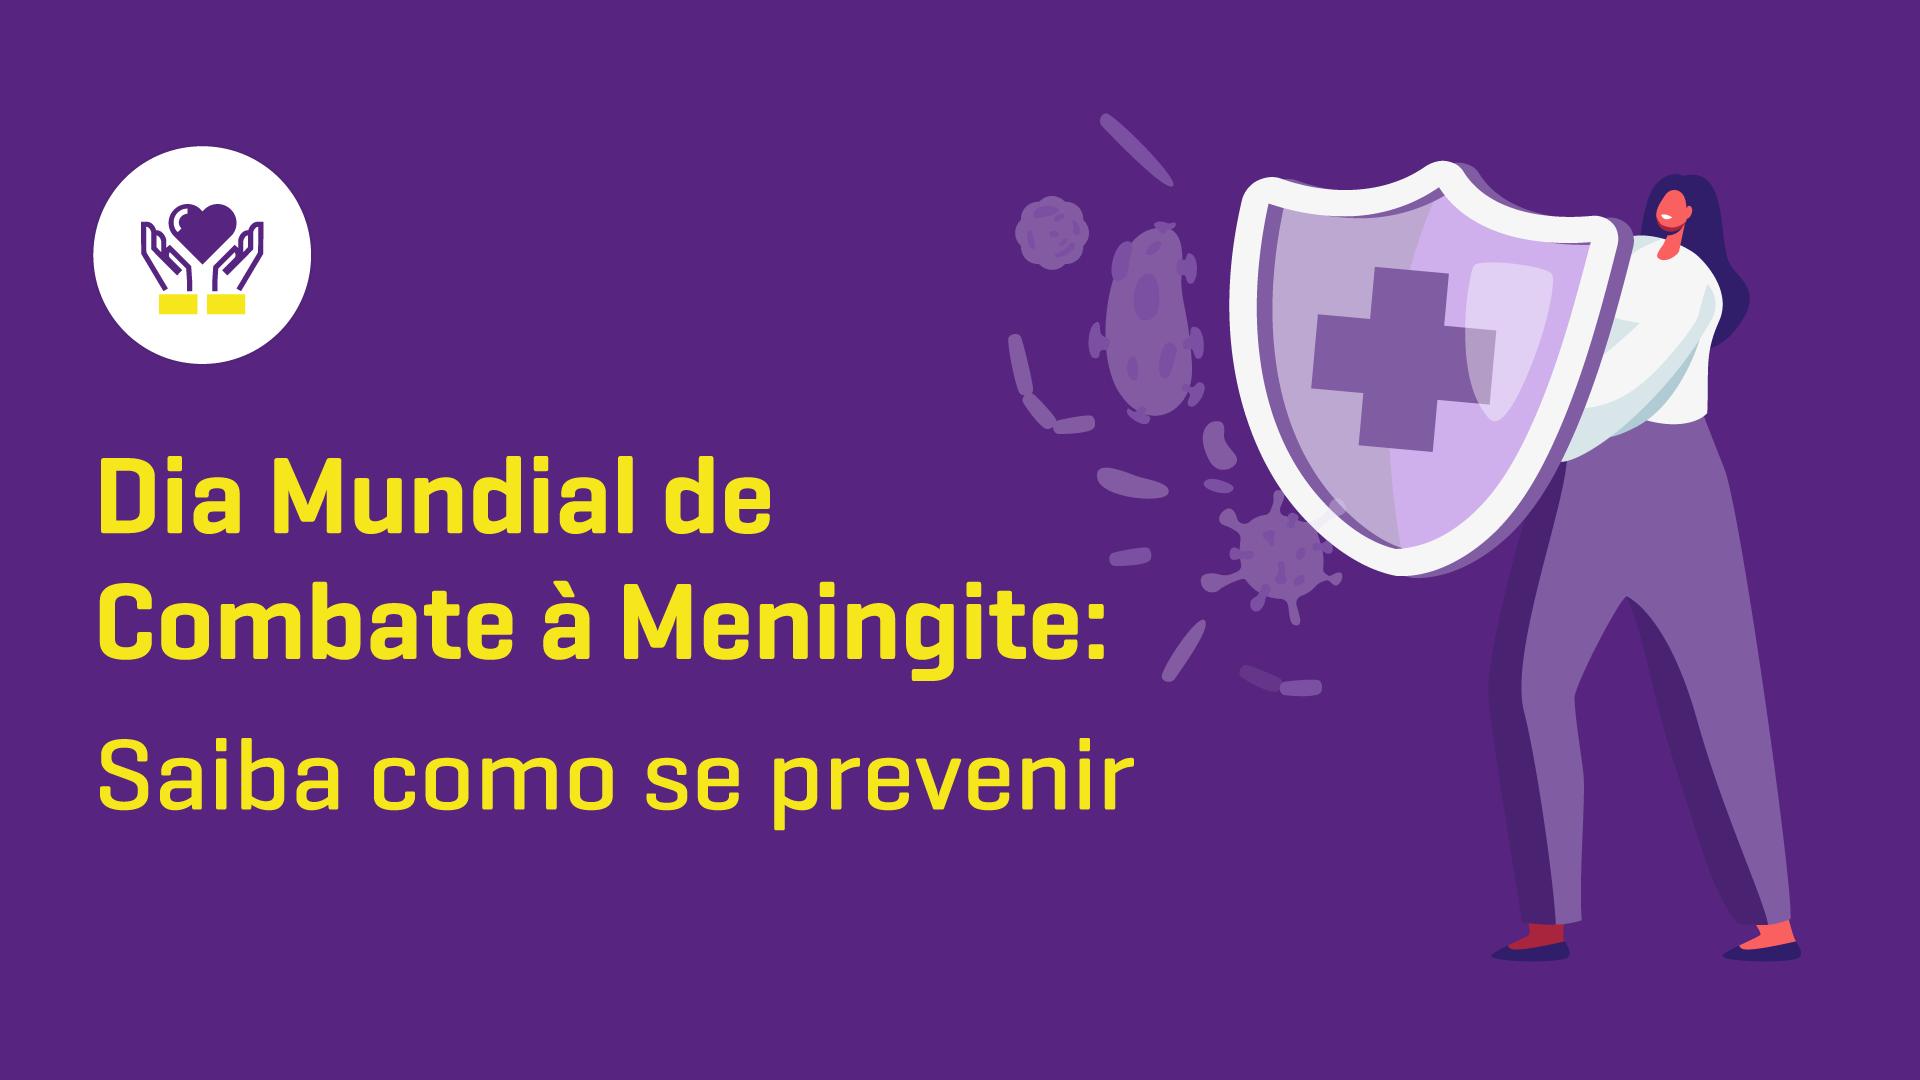 Dia Mundial de Combate à Meningite: saiba como se prevenir